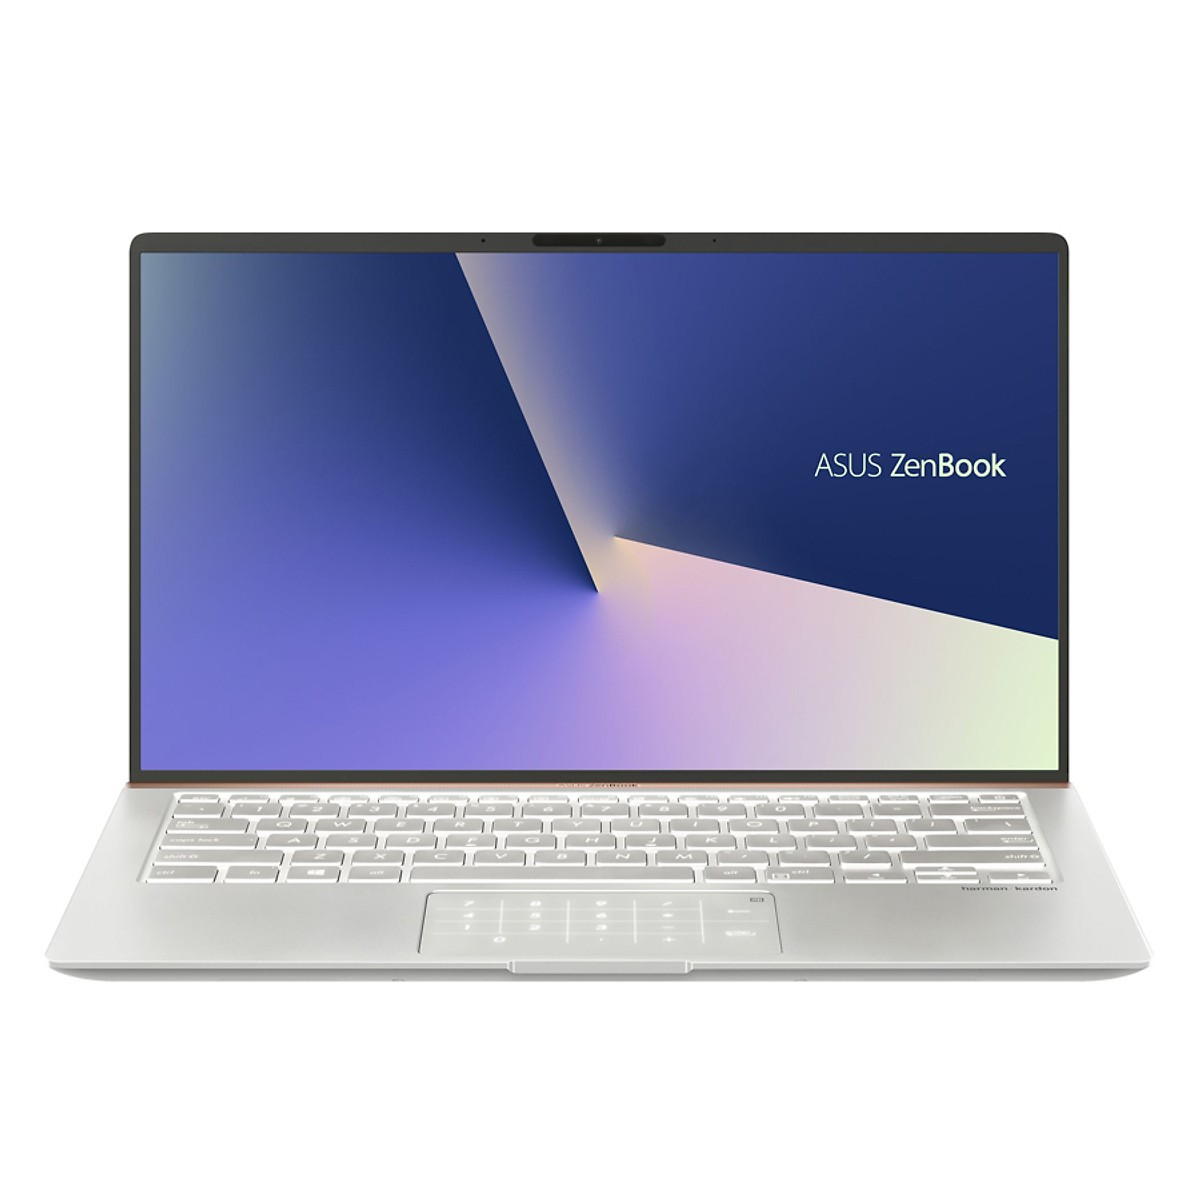 ASUS Zenbook UX433FA (A6111T) Vỏ nhôm bạc